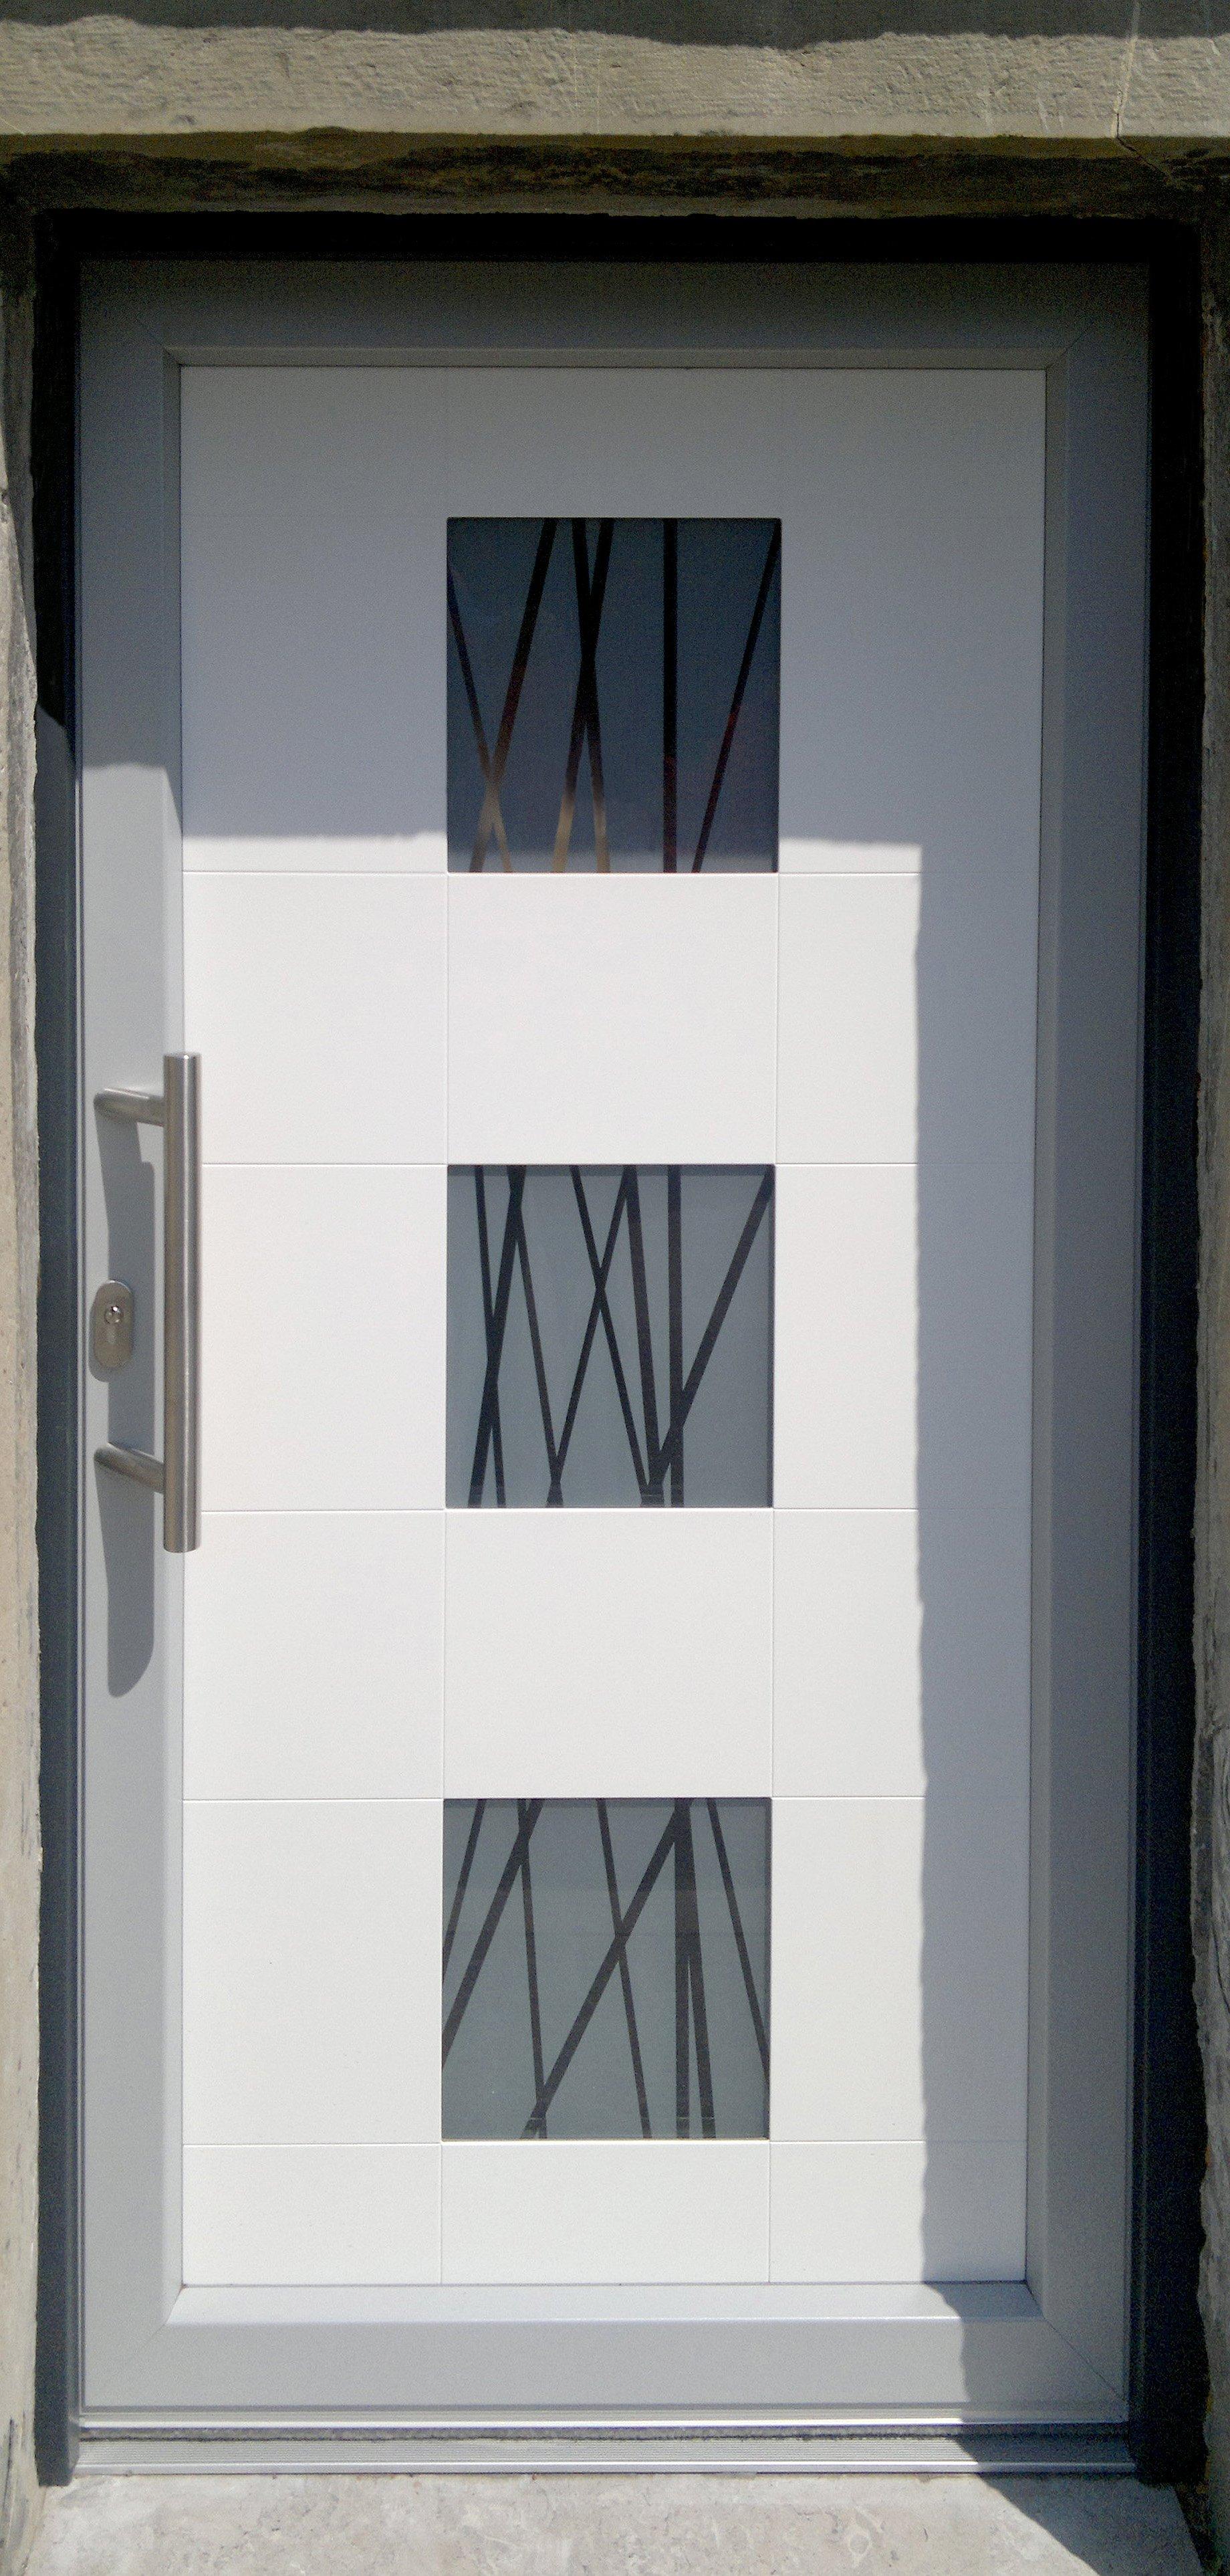 Emejing Portoncino Blindato Prezzo Contemporary - acrylicgiftware ...